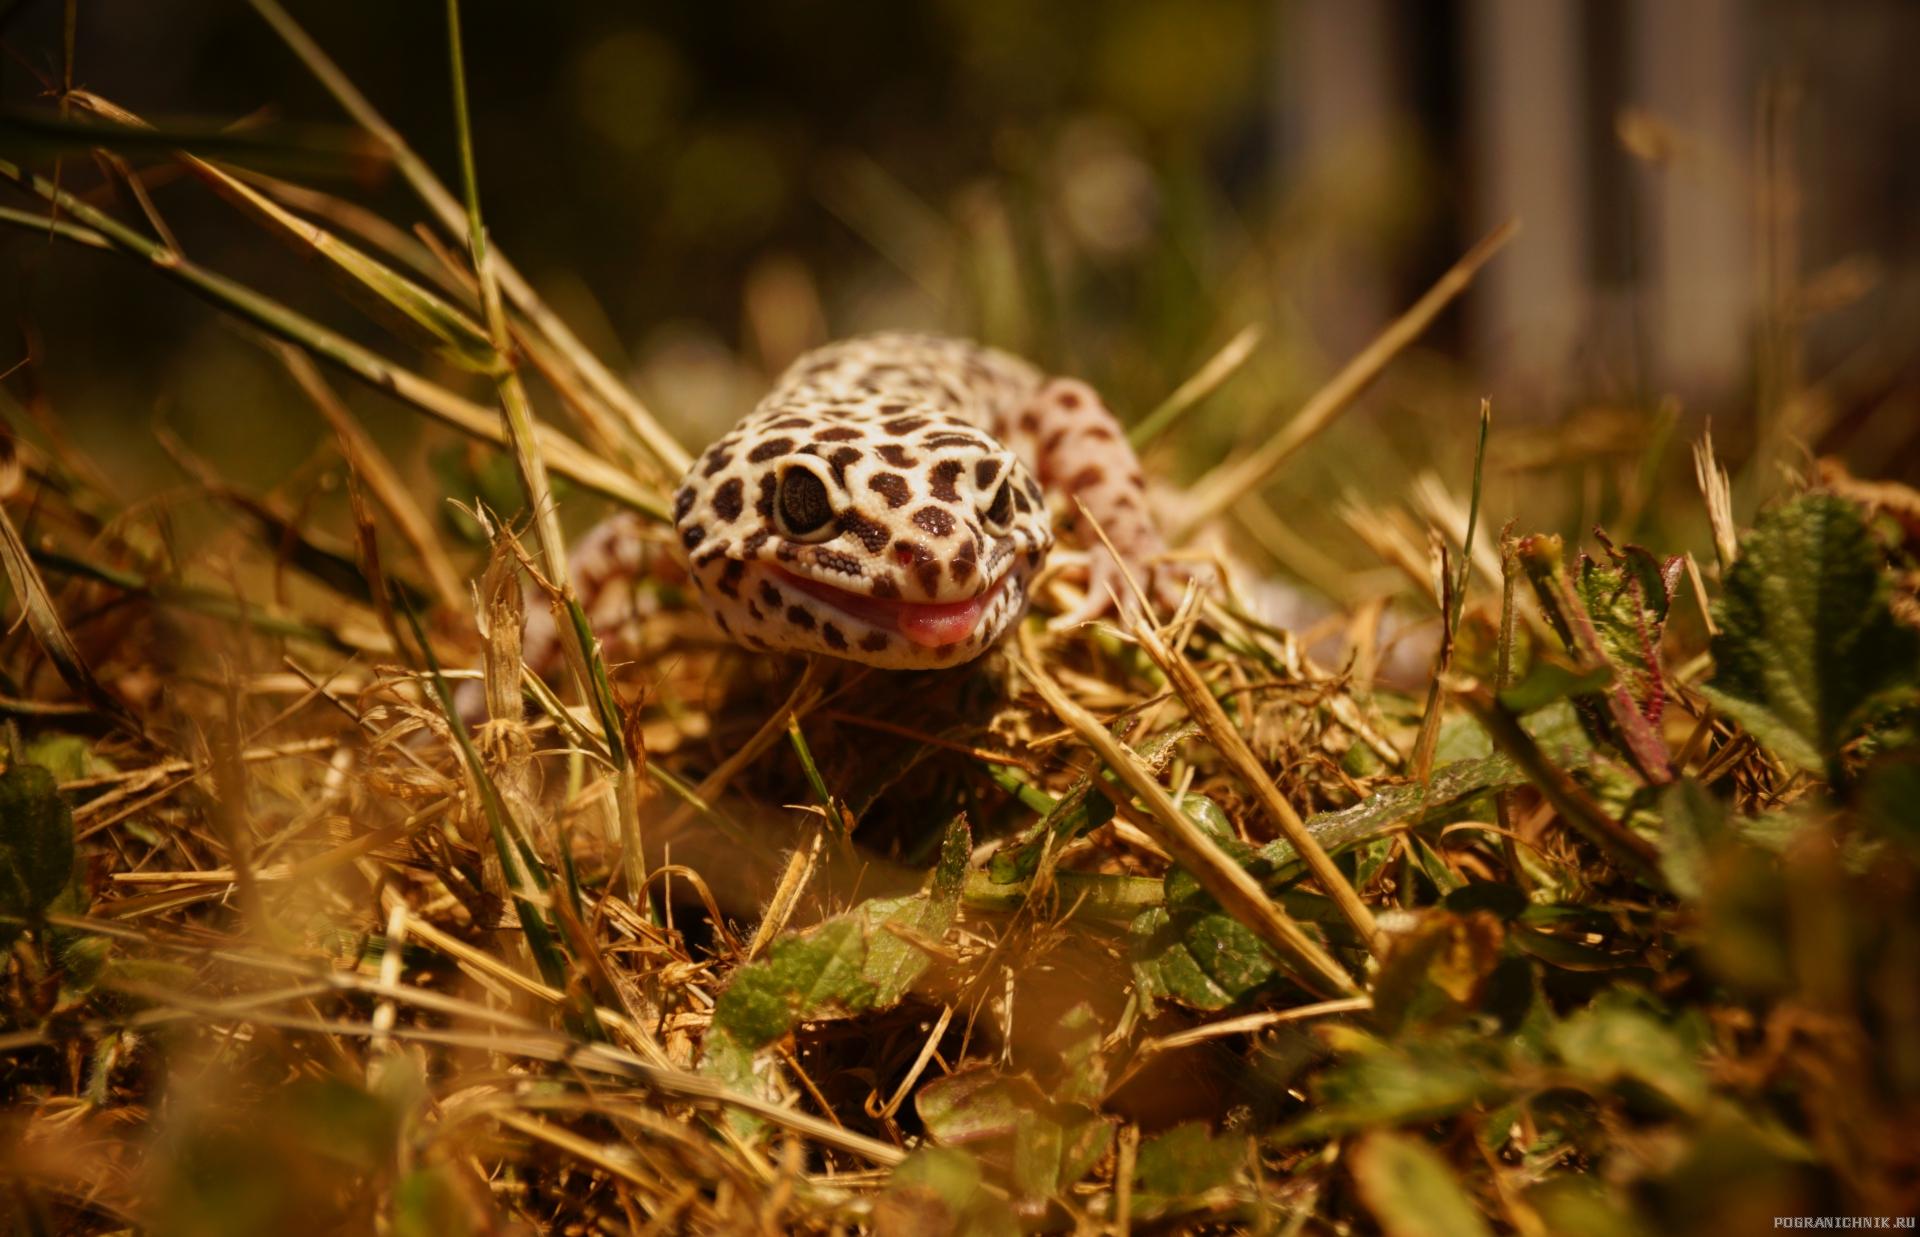 Мой ласковый геккон Стёпа!